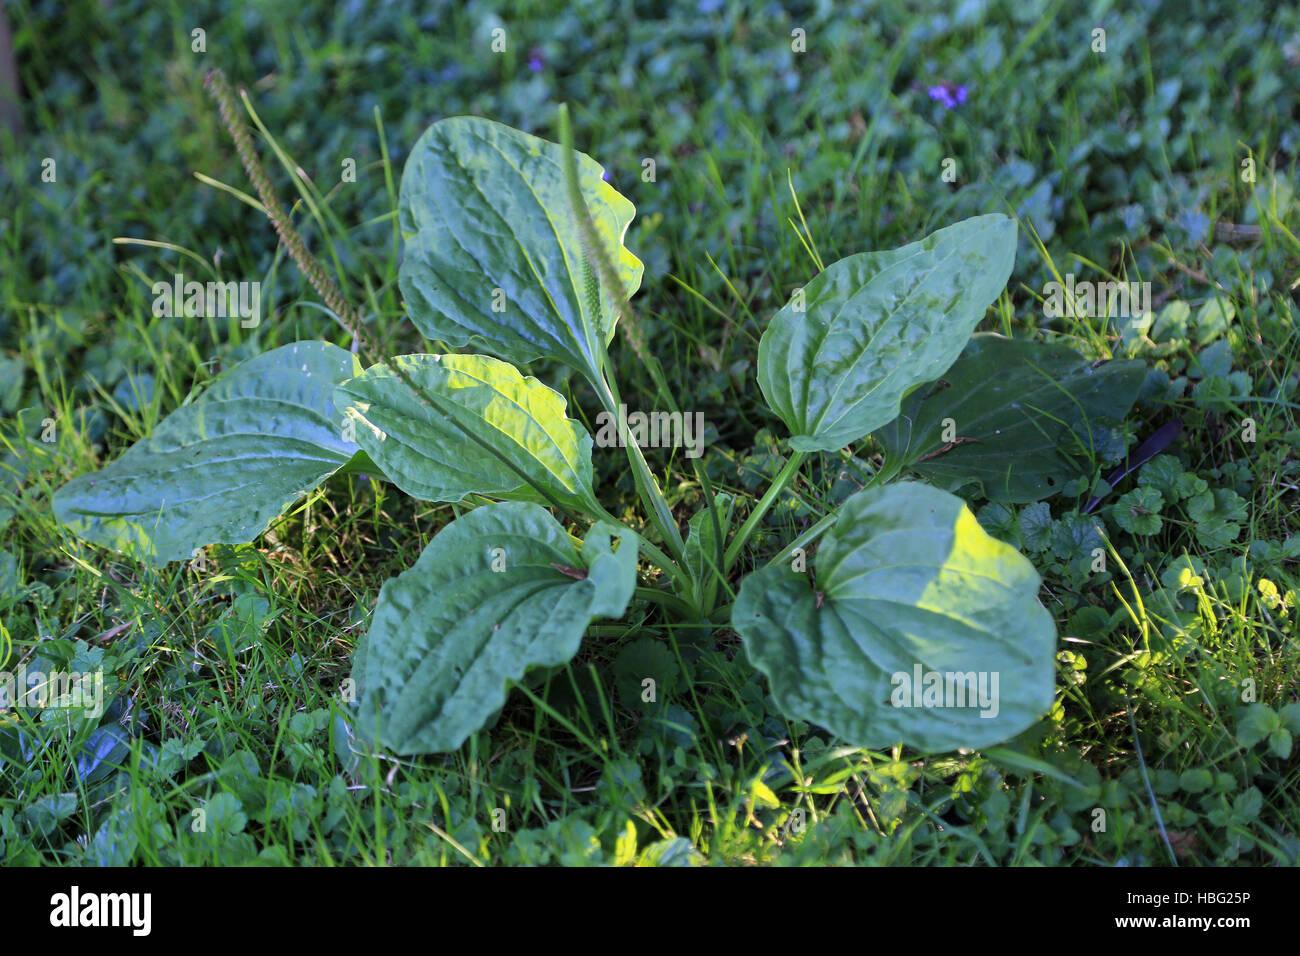 Broadleaf plantain, Plantago major - Stock Image